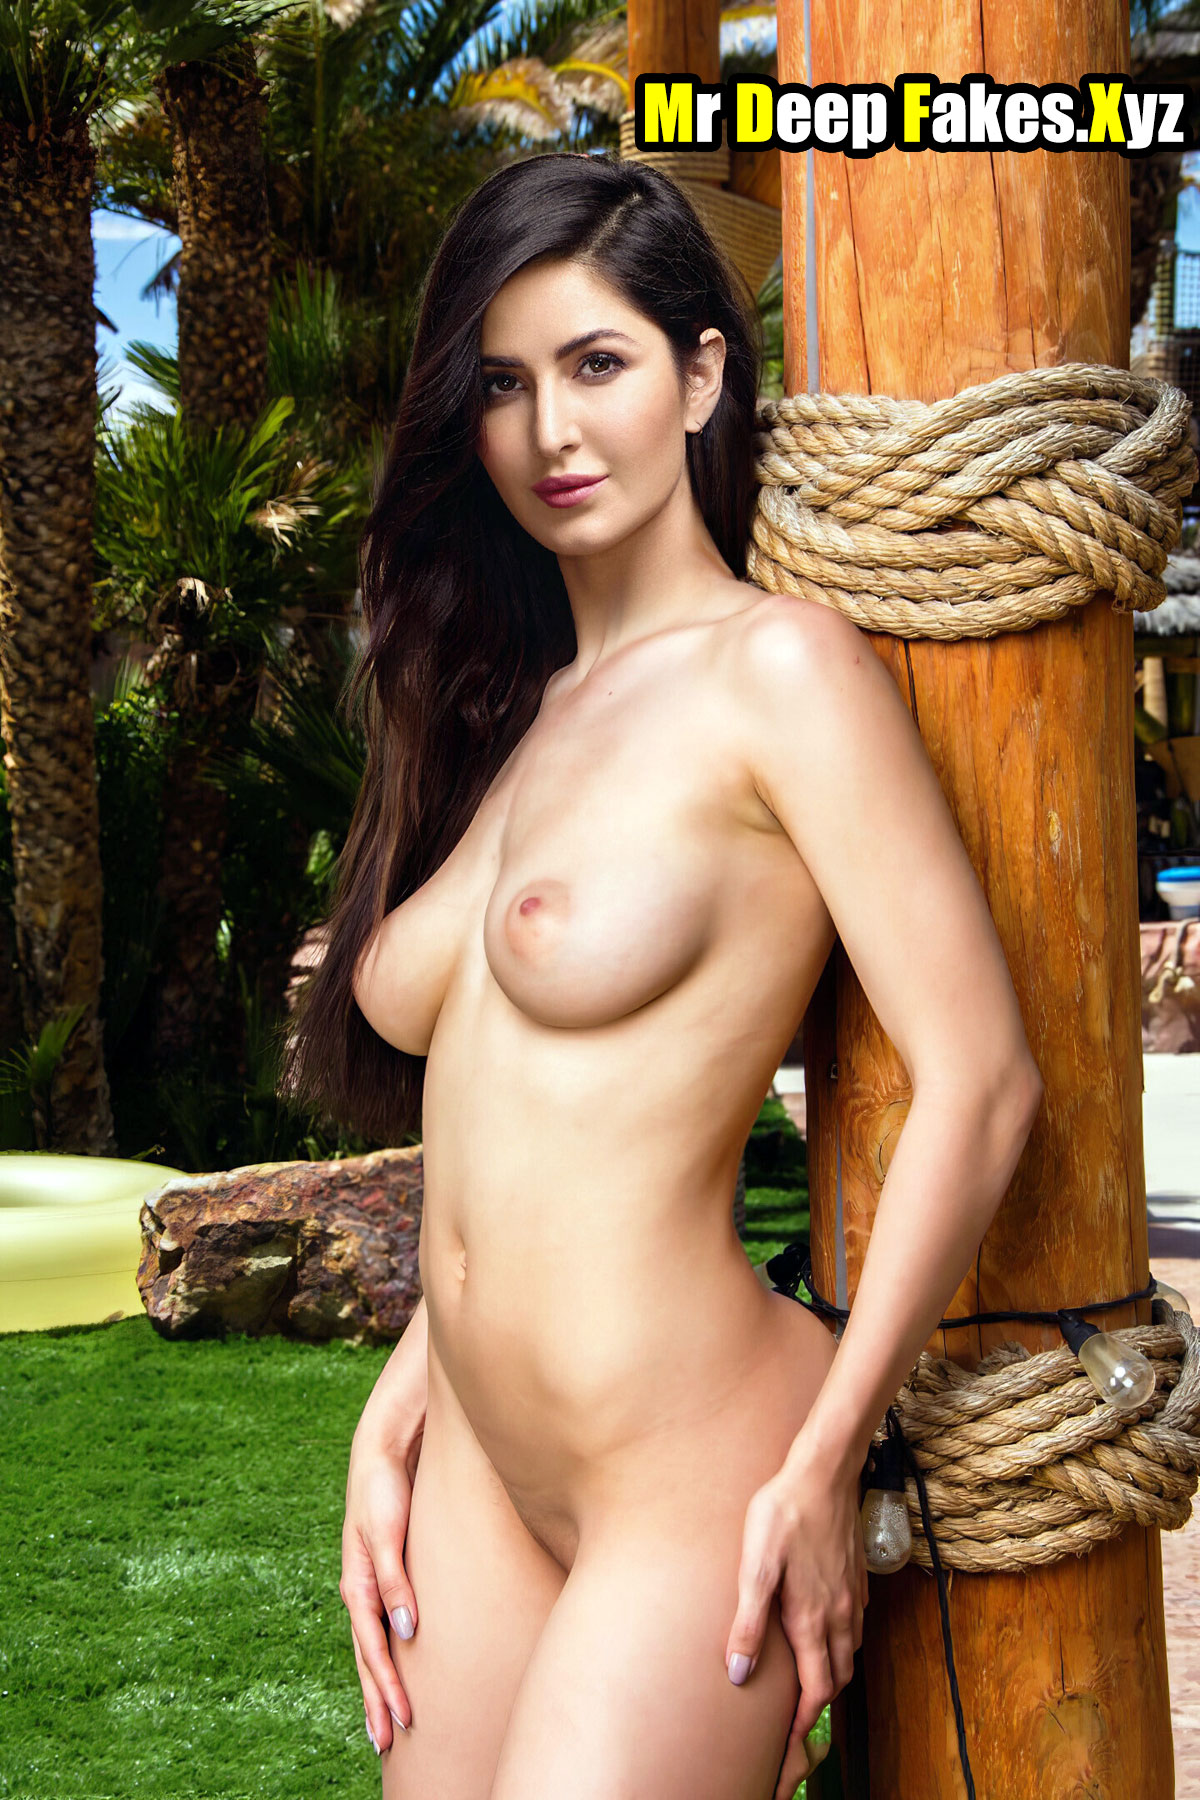 Full Nude Katrina Kaif free outdoor photoshoot without dress